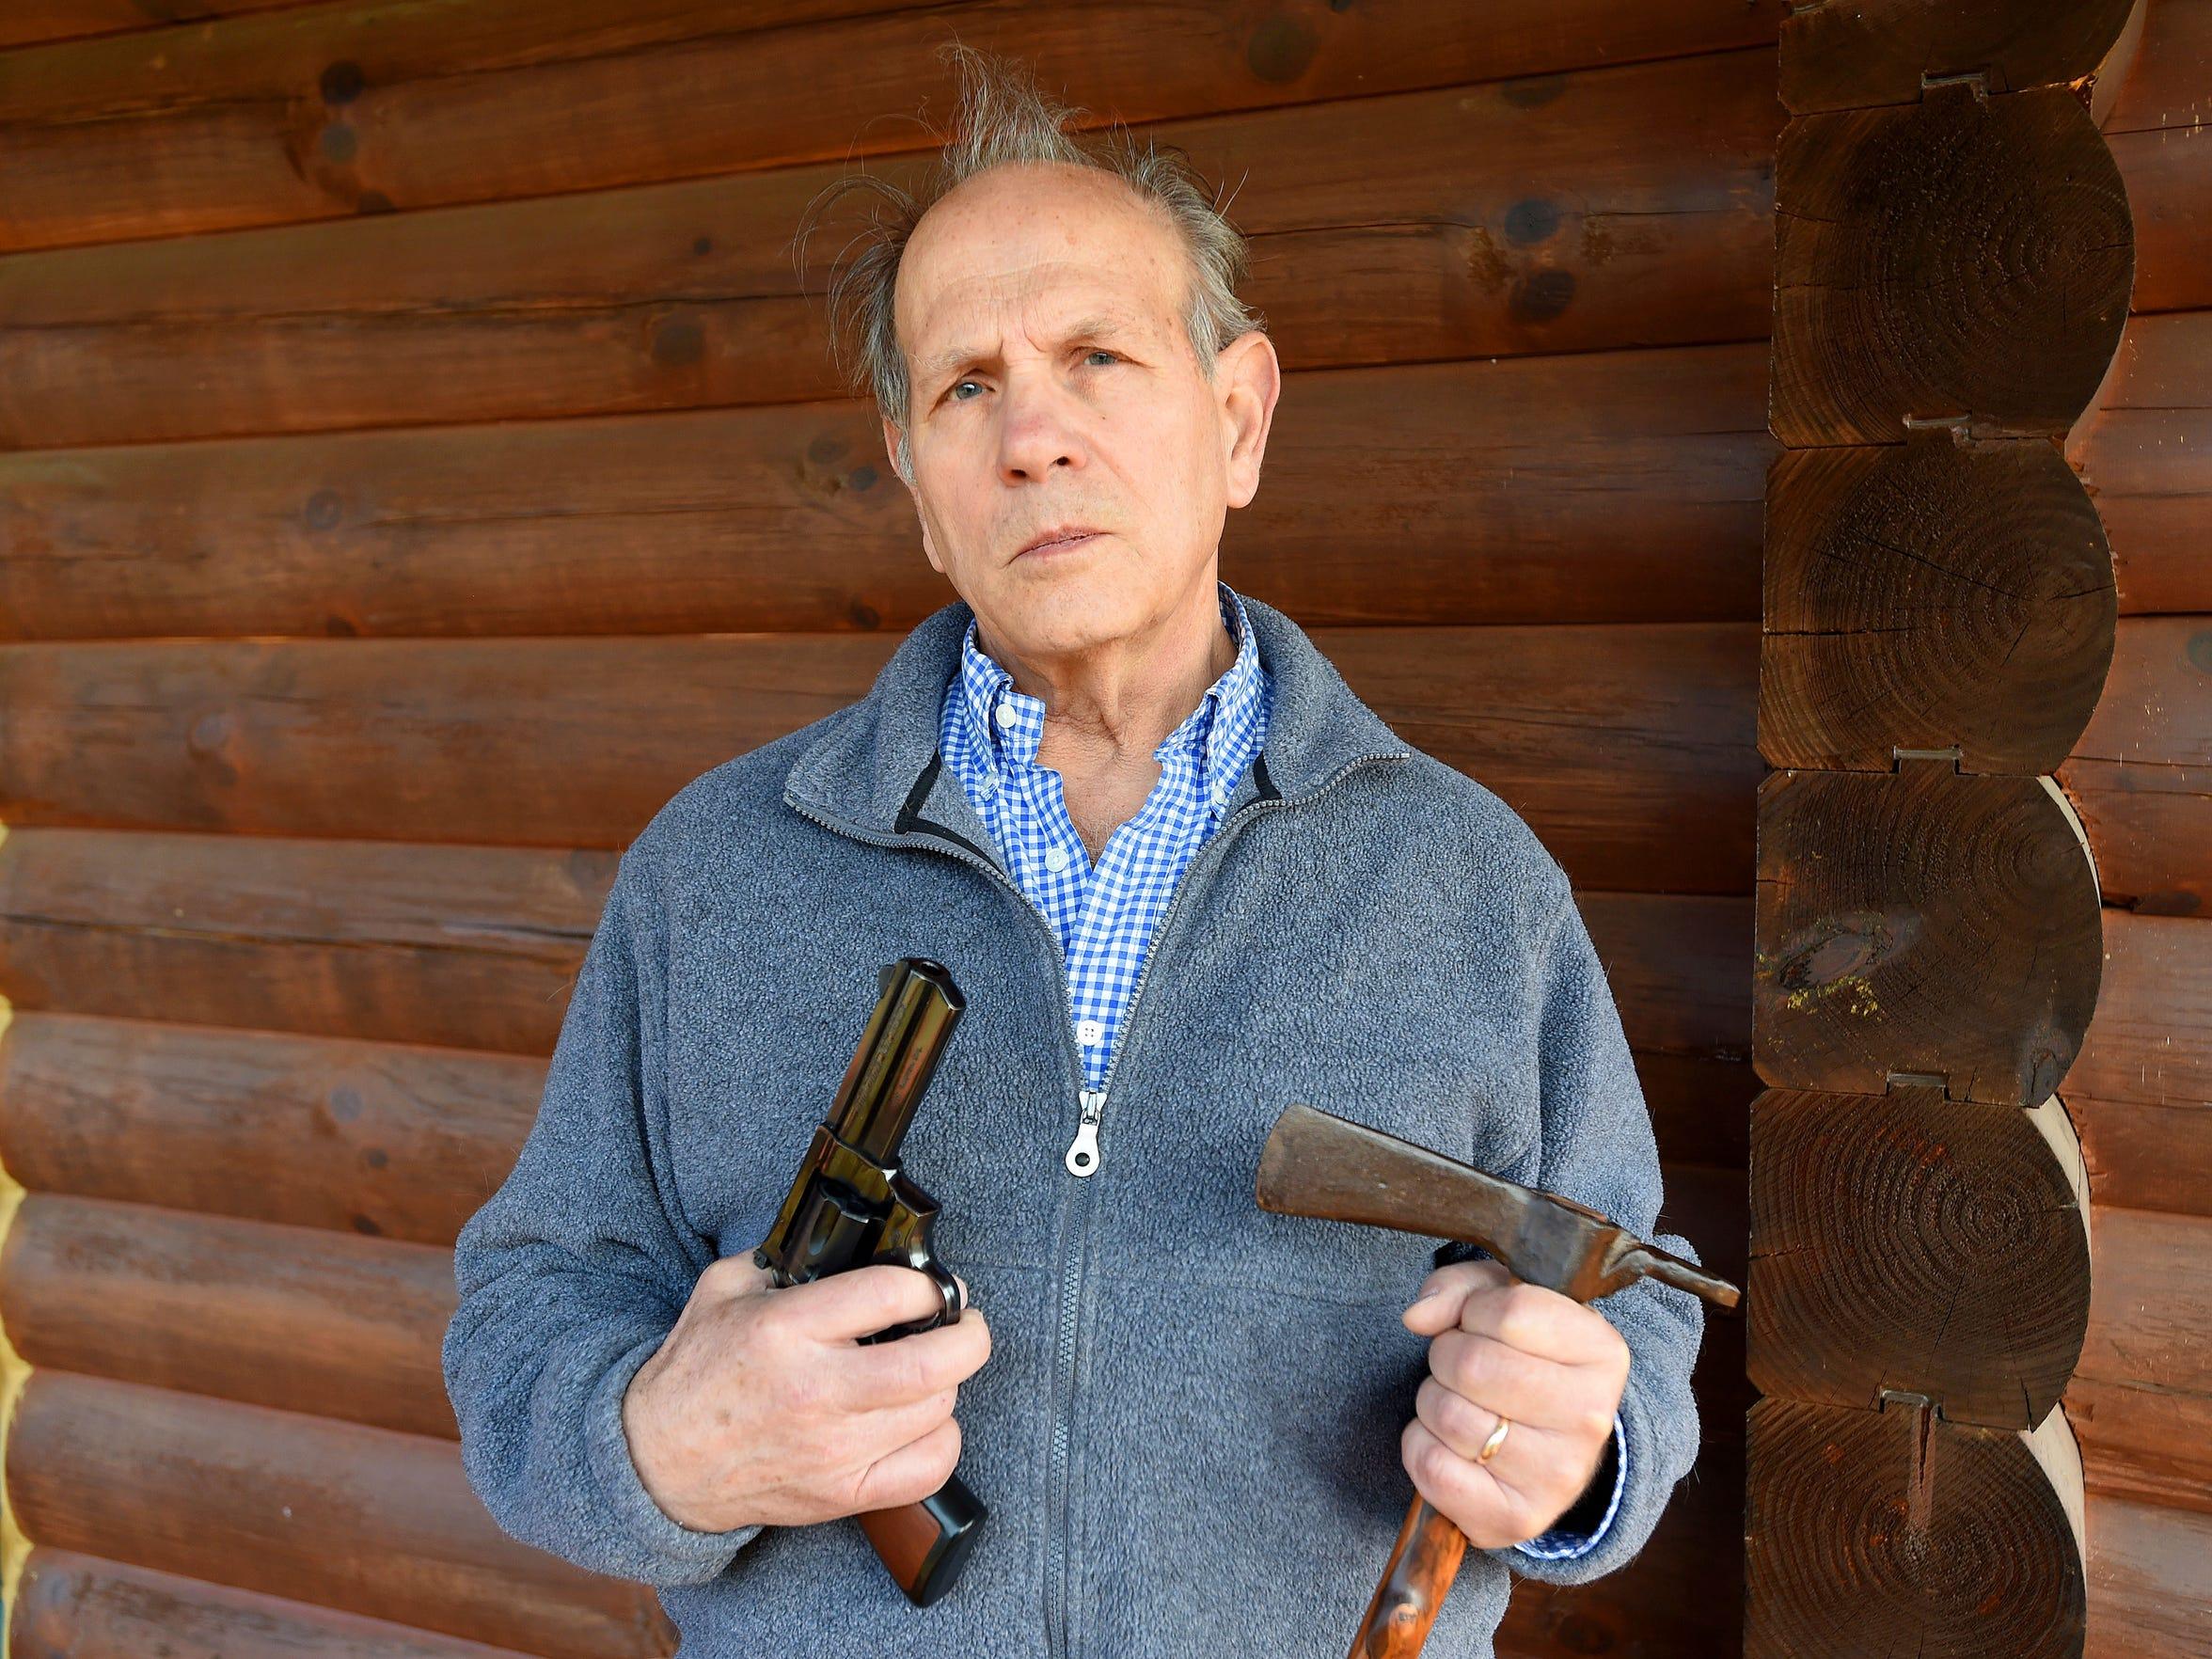 Jim Lambiase appreciates the mechanics of firearms